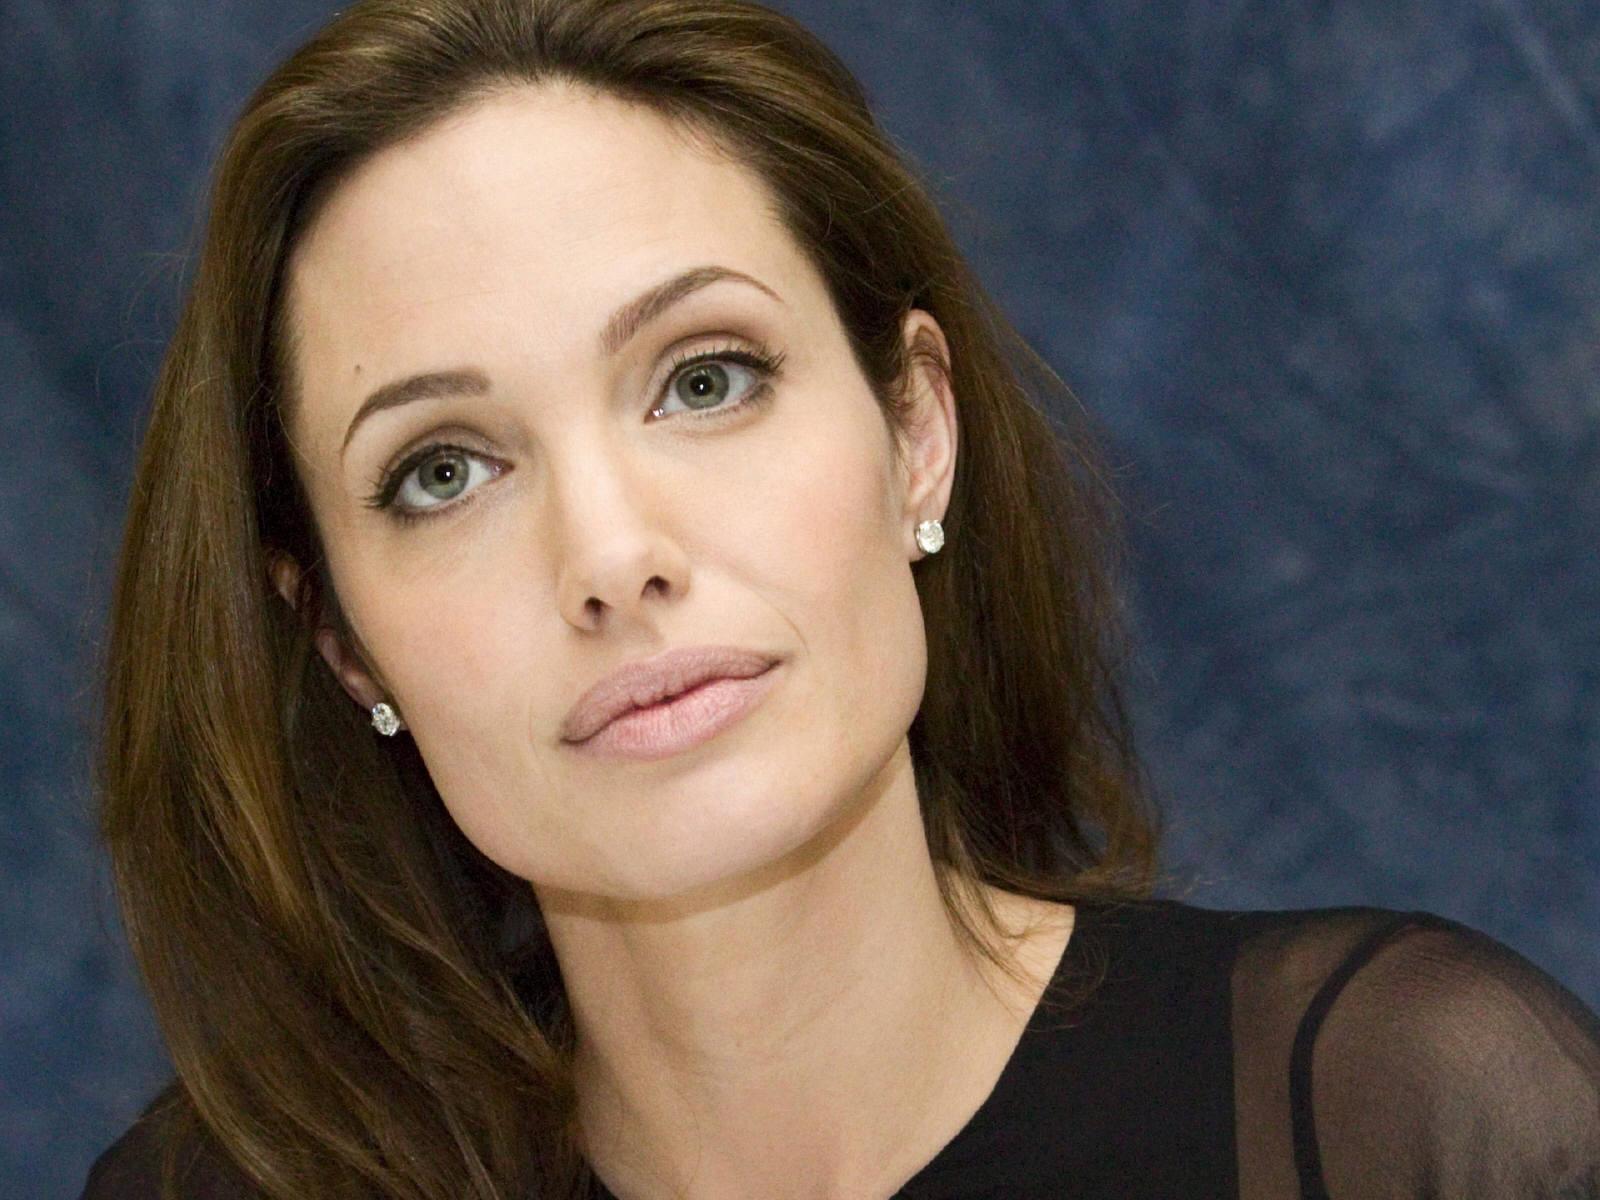 http://4.bp.blogspot.com/-bHXbyHRnh5E/UDHp7lz2V6I/AAAAAAAAU7c/GzdJrHkD8Ek/s1600/Angelina-Jolie01_0.jpg